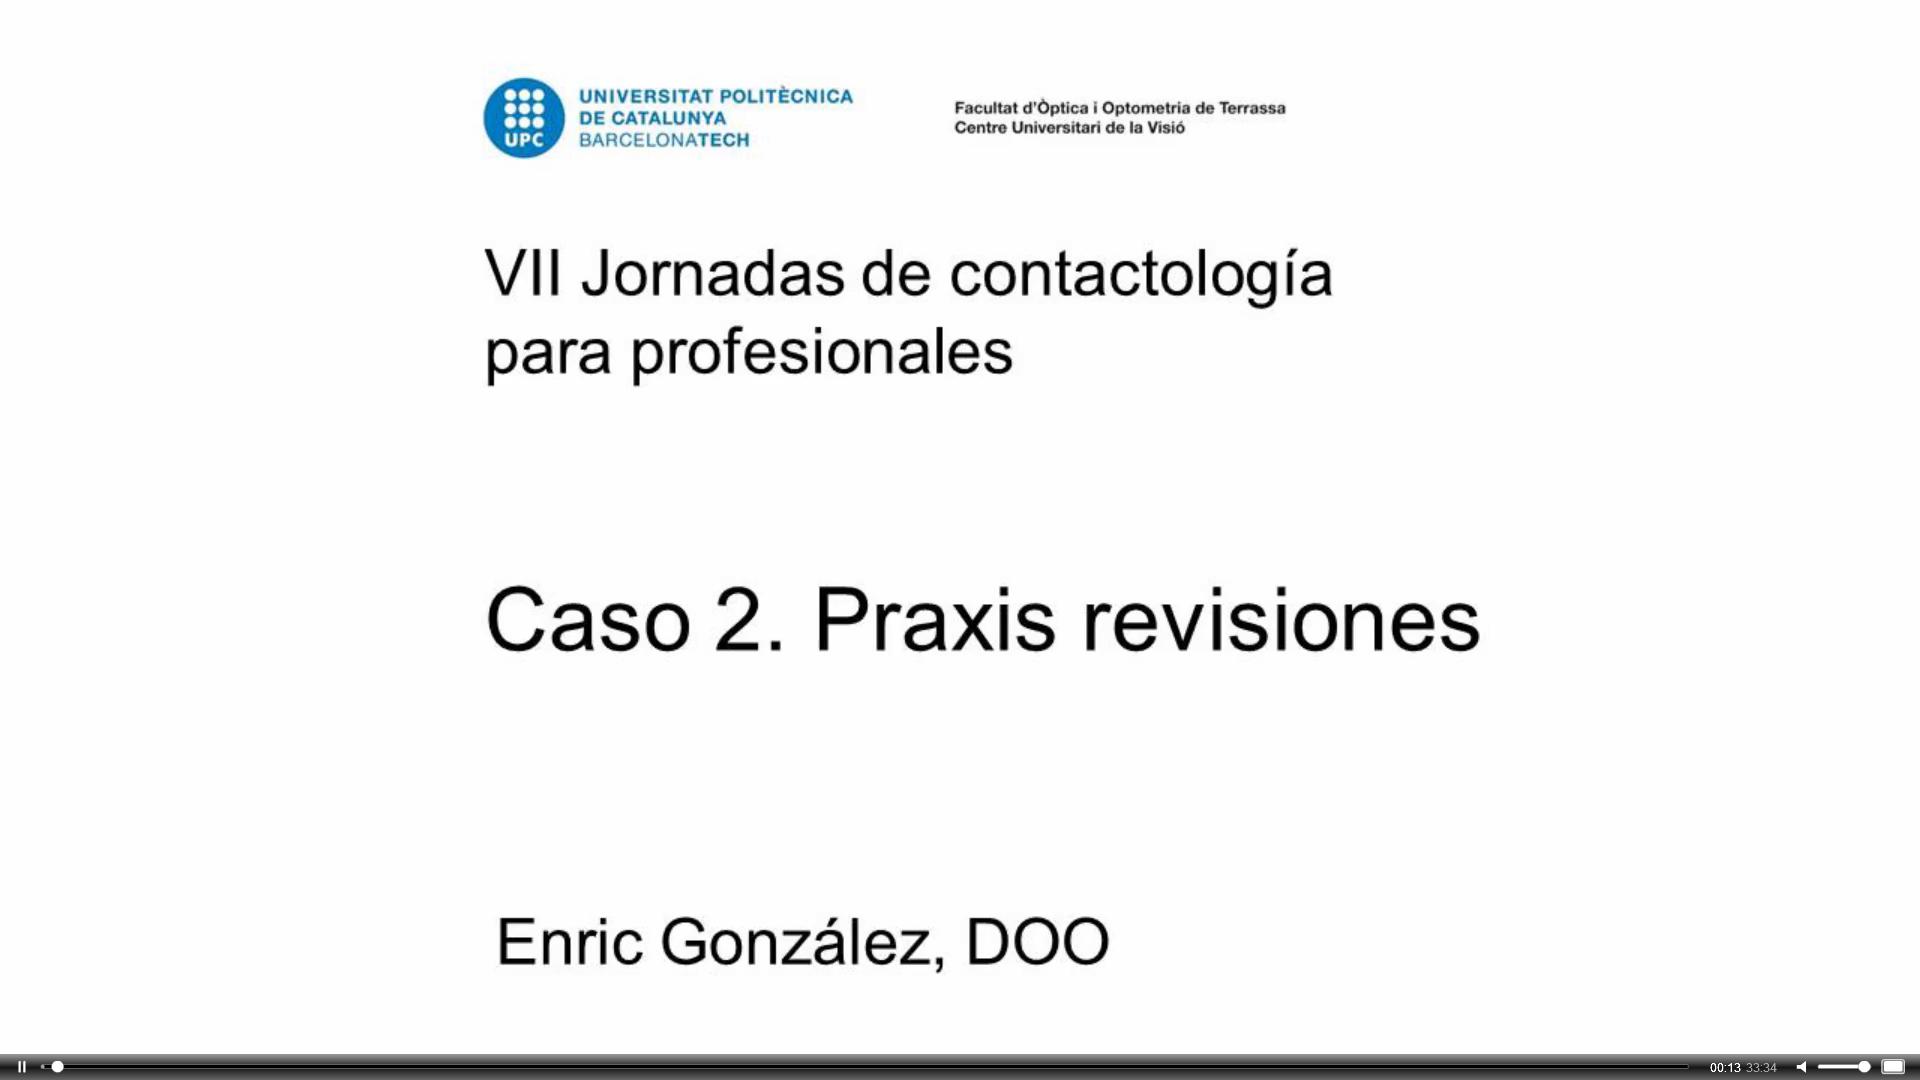 JLC2017_caso_2(Enric_Gonzalez)